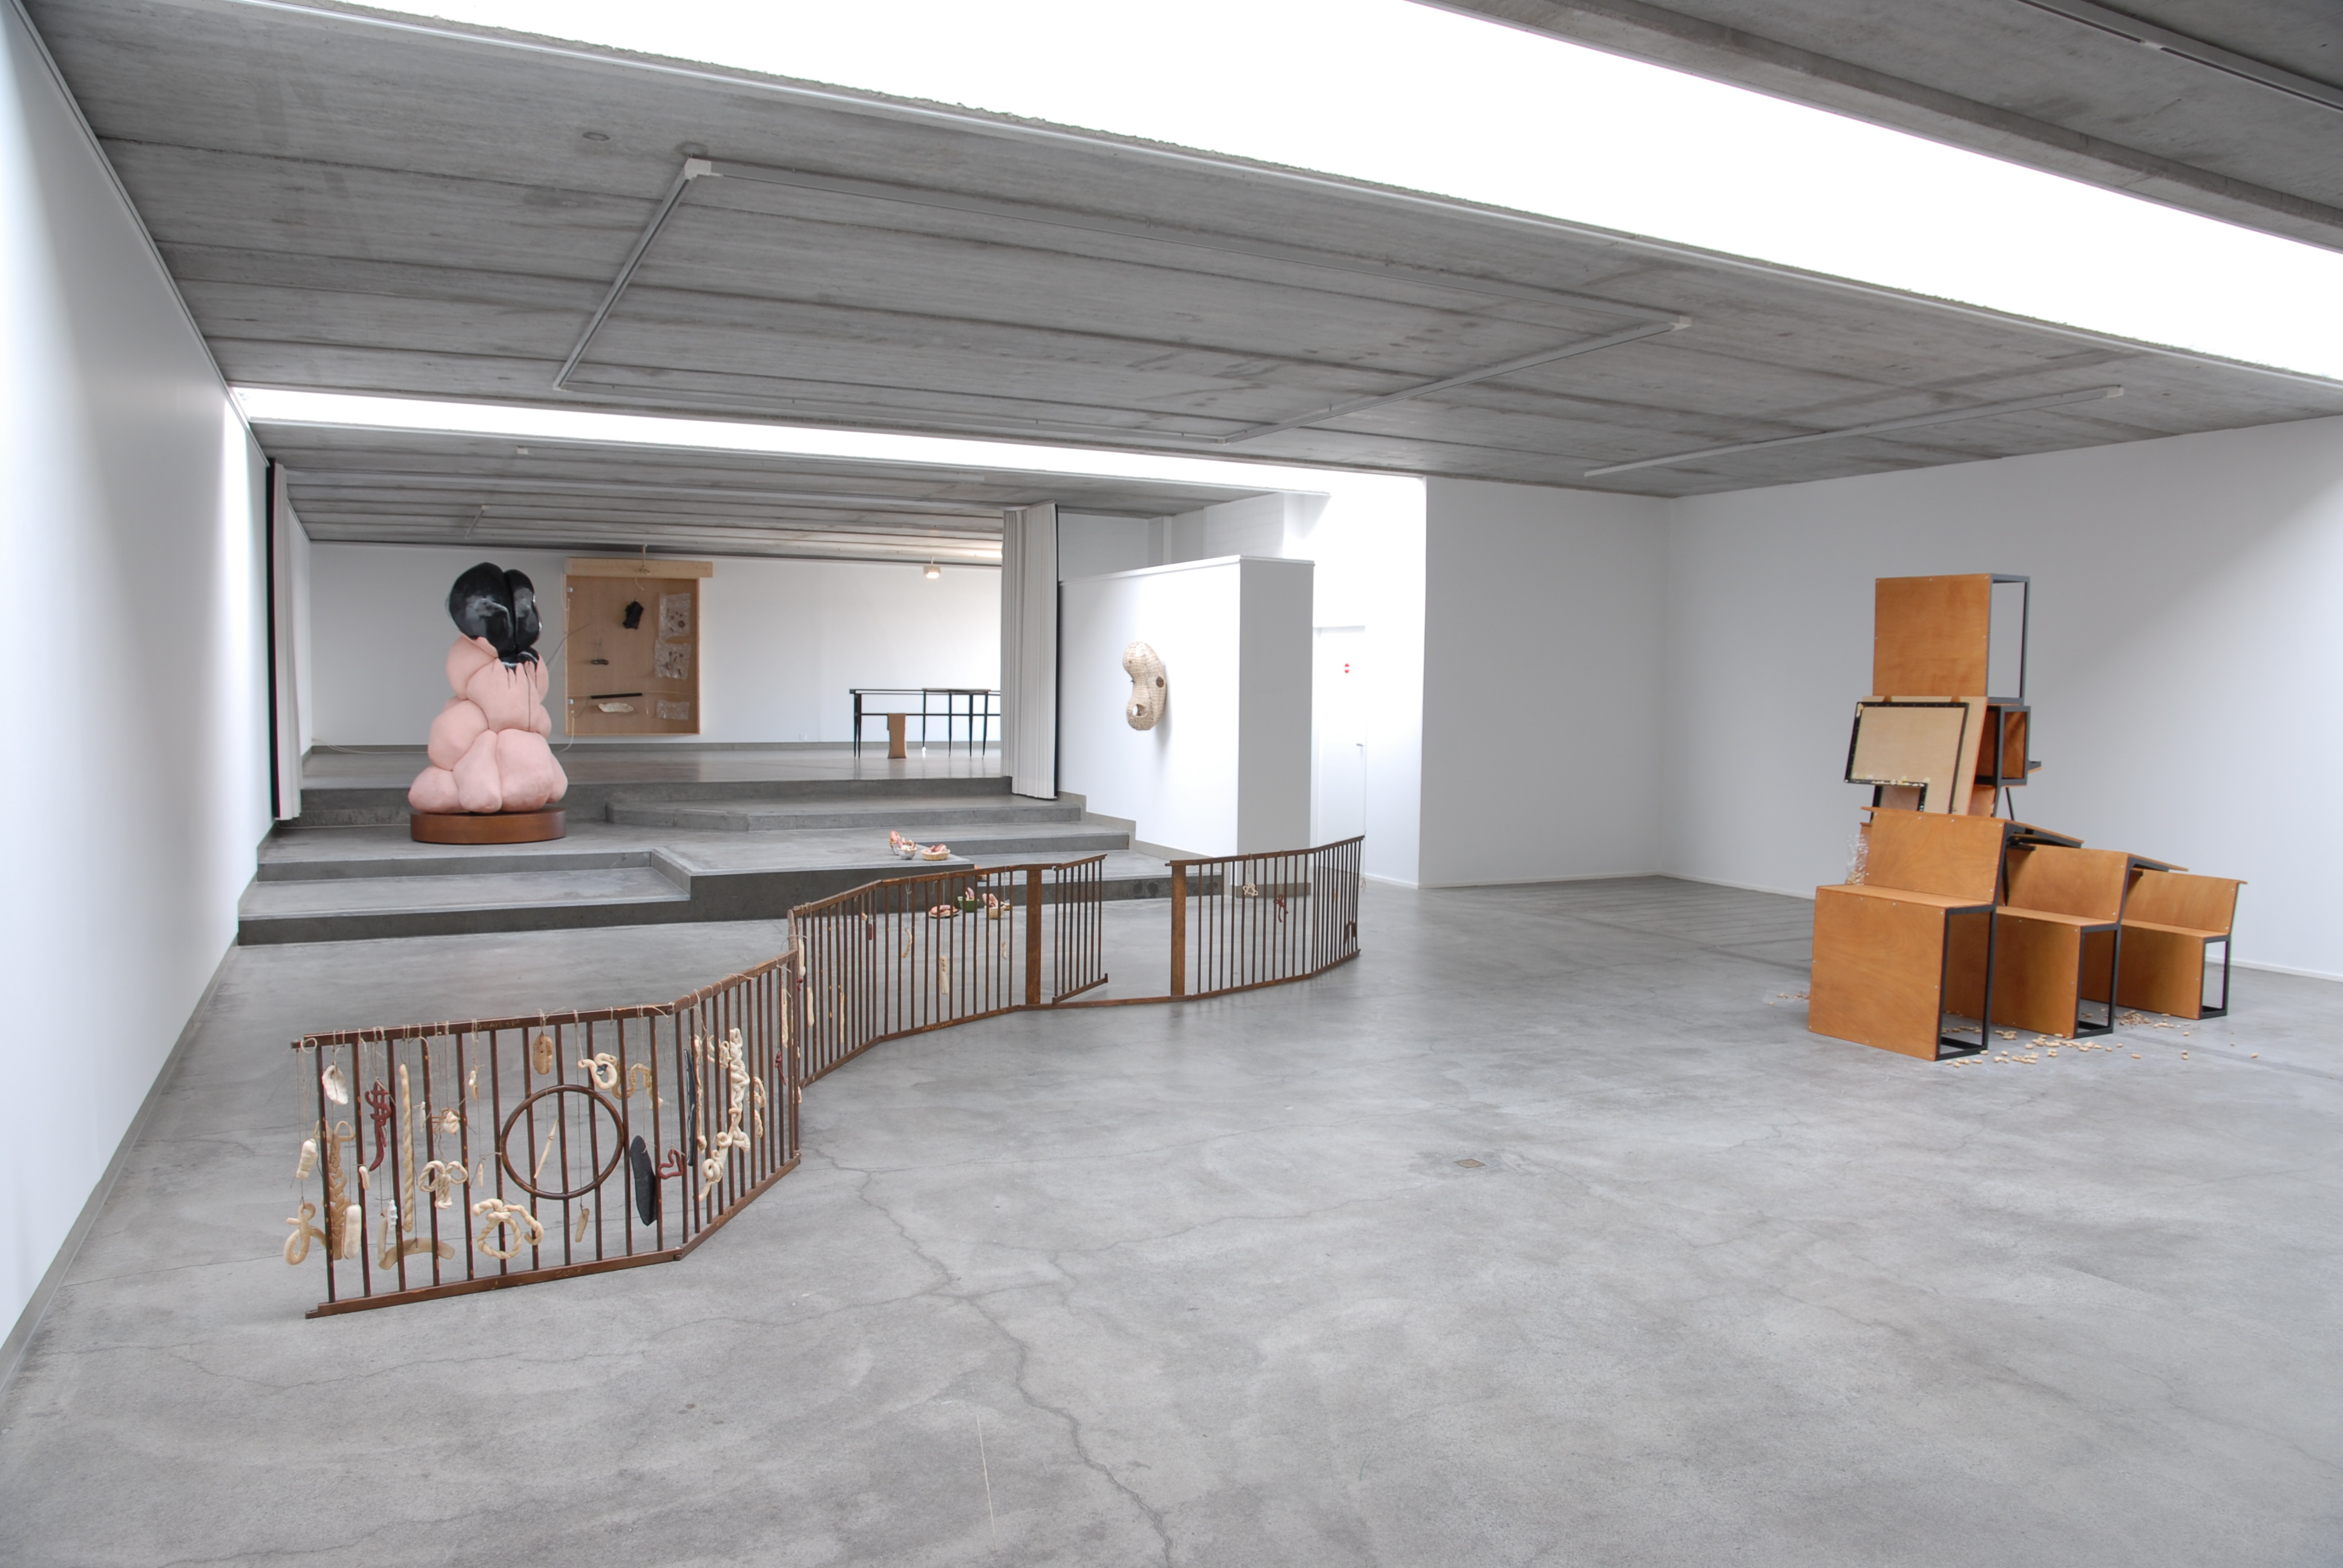 Kasia Fudakowksi, Where is your alibi, Mr. Motorway?, 2013 - exhibition view